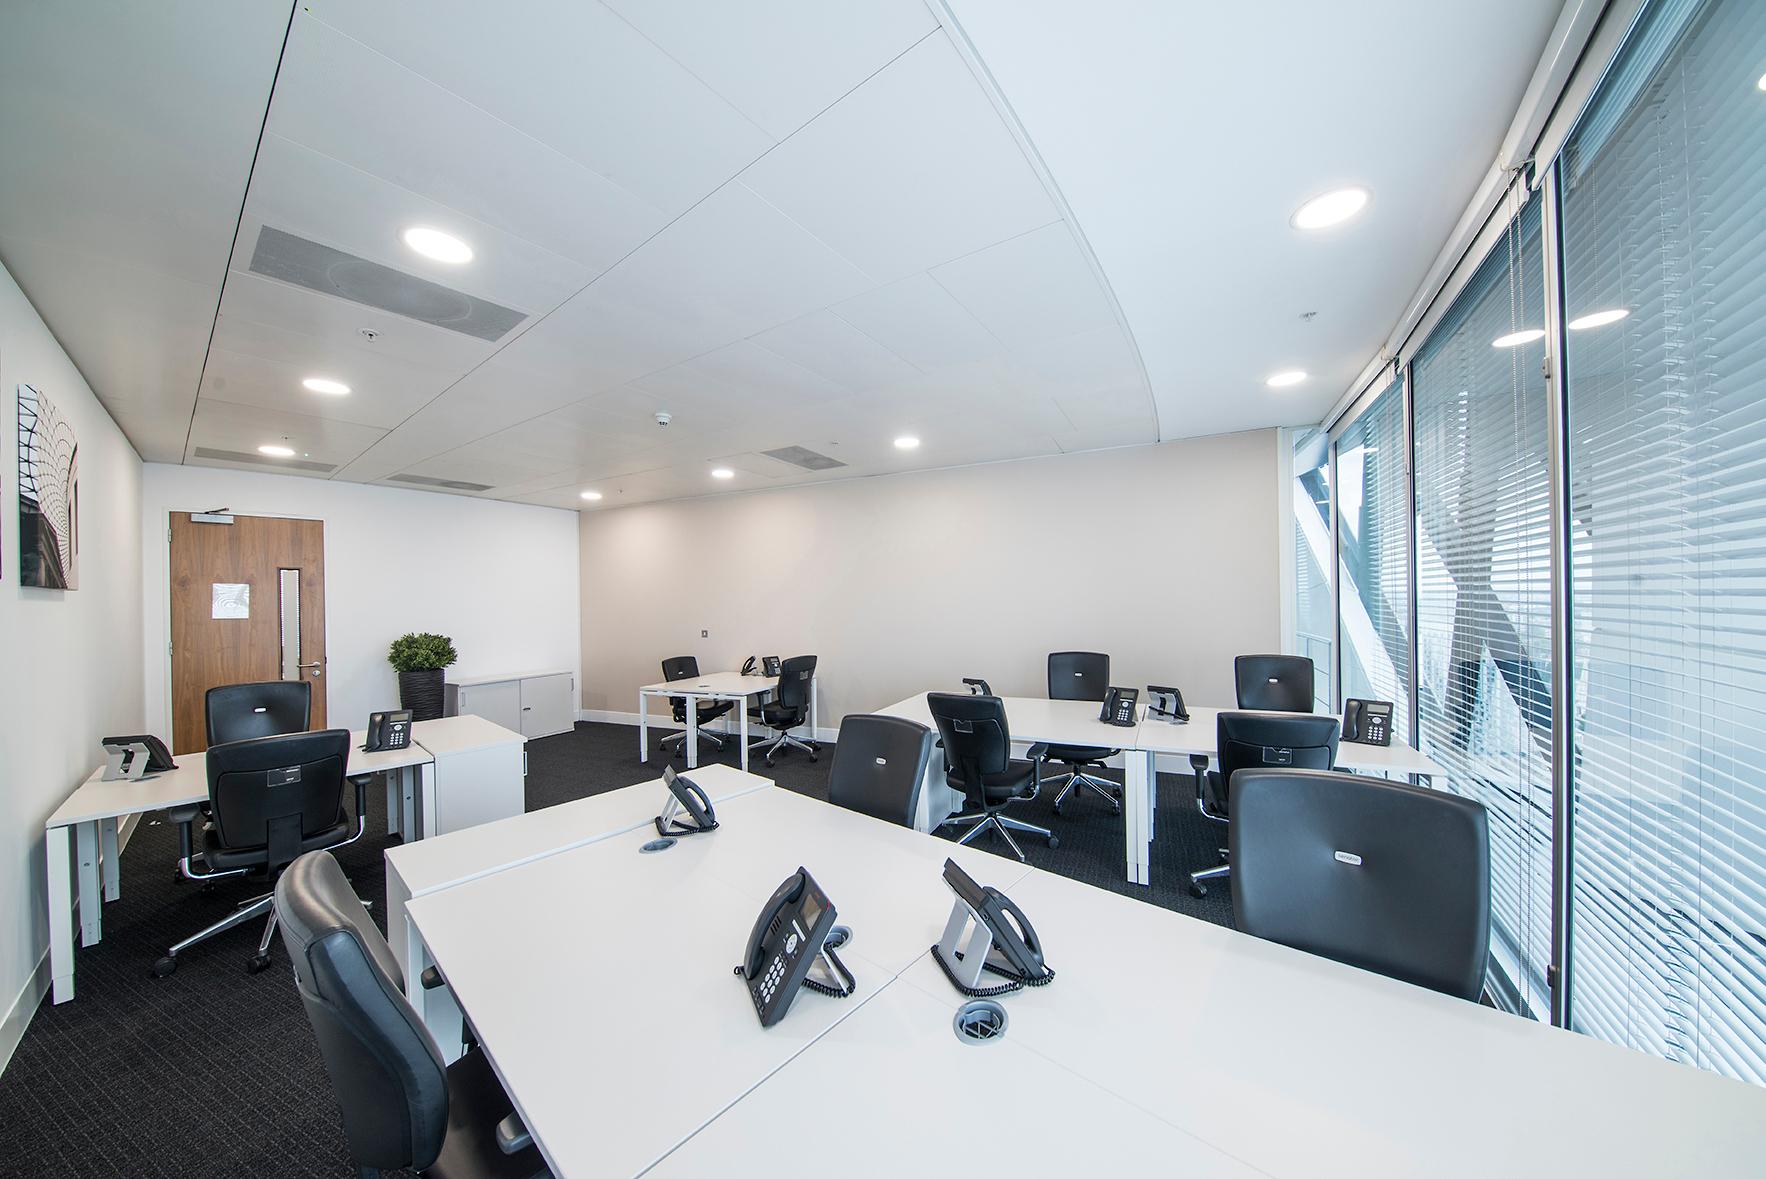 Regus - London, 63 St Mary Axe, London | Office Rental